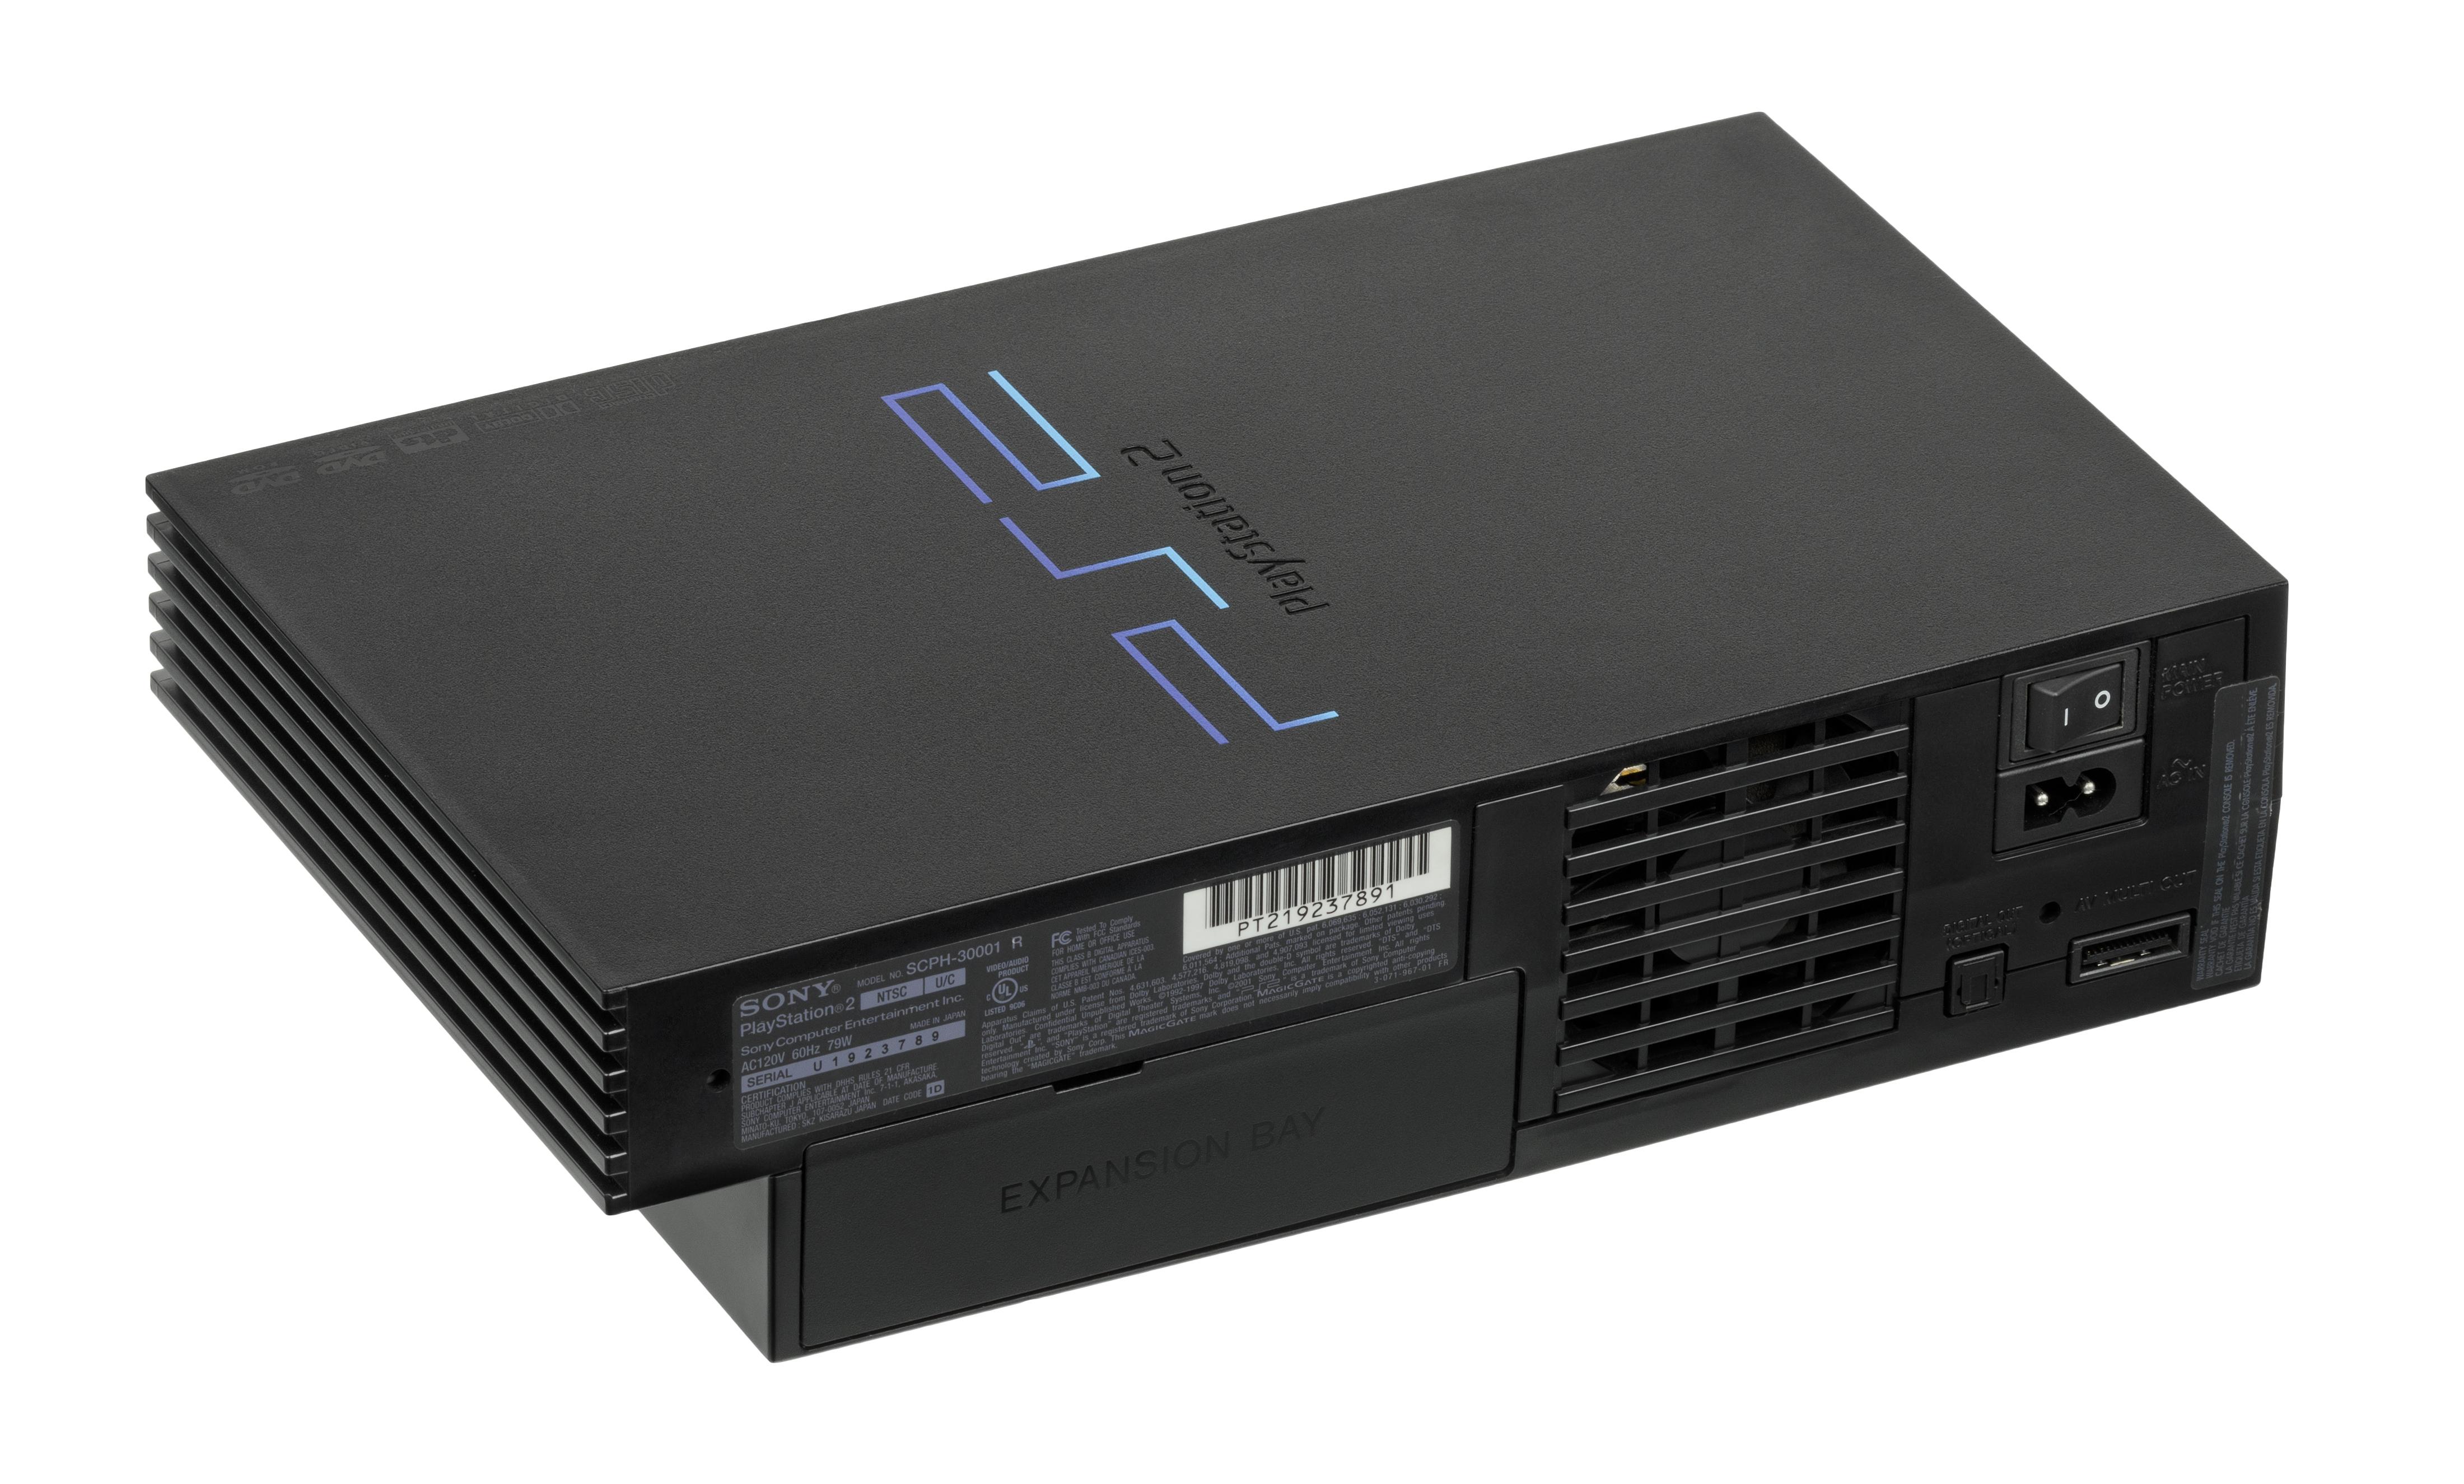 sony playstation 2. file:sony-playstation-2-30001-console-bl.jpg sony playstation 2